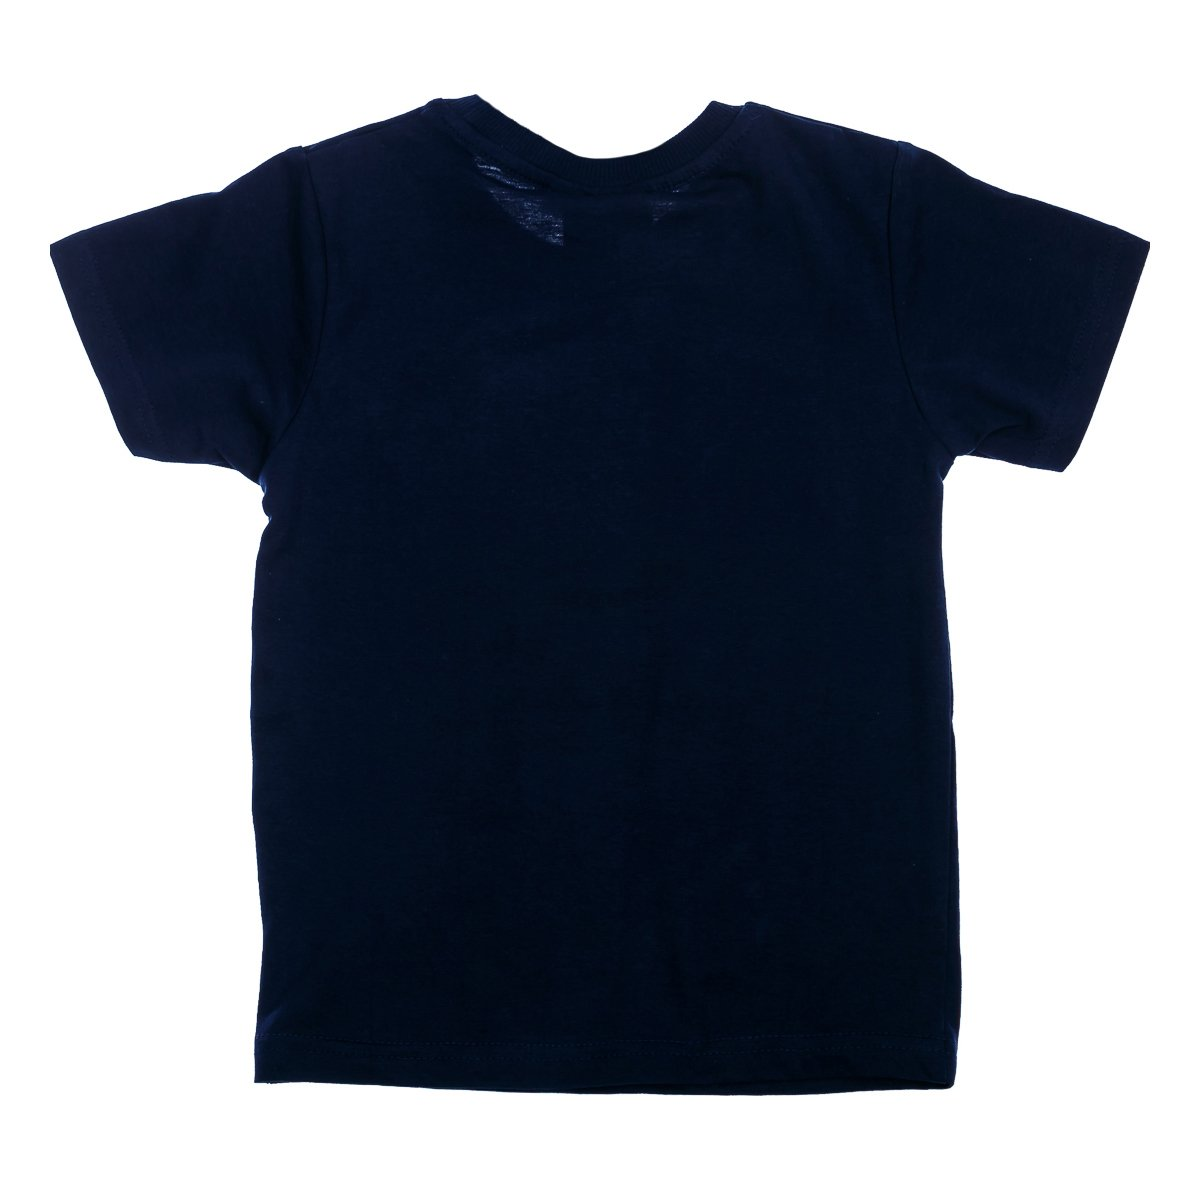 Купить Футболки, майки, топы, туники, Футболка E Plus M Batman Blue, р. 140 BAT5202184 ТМ: E Plus M, синий